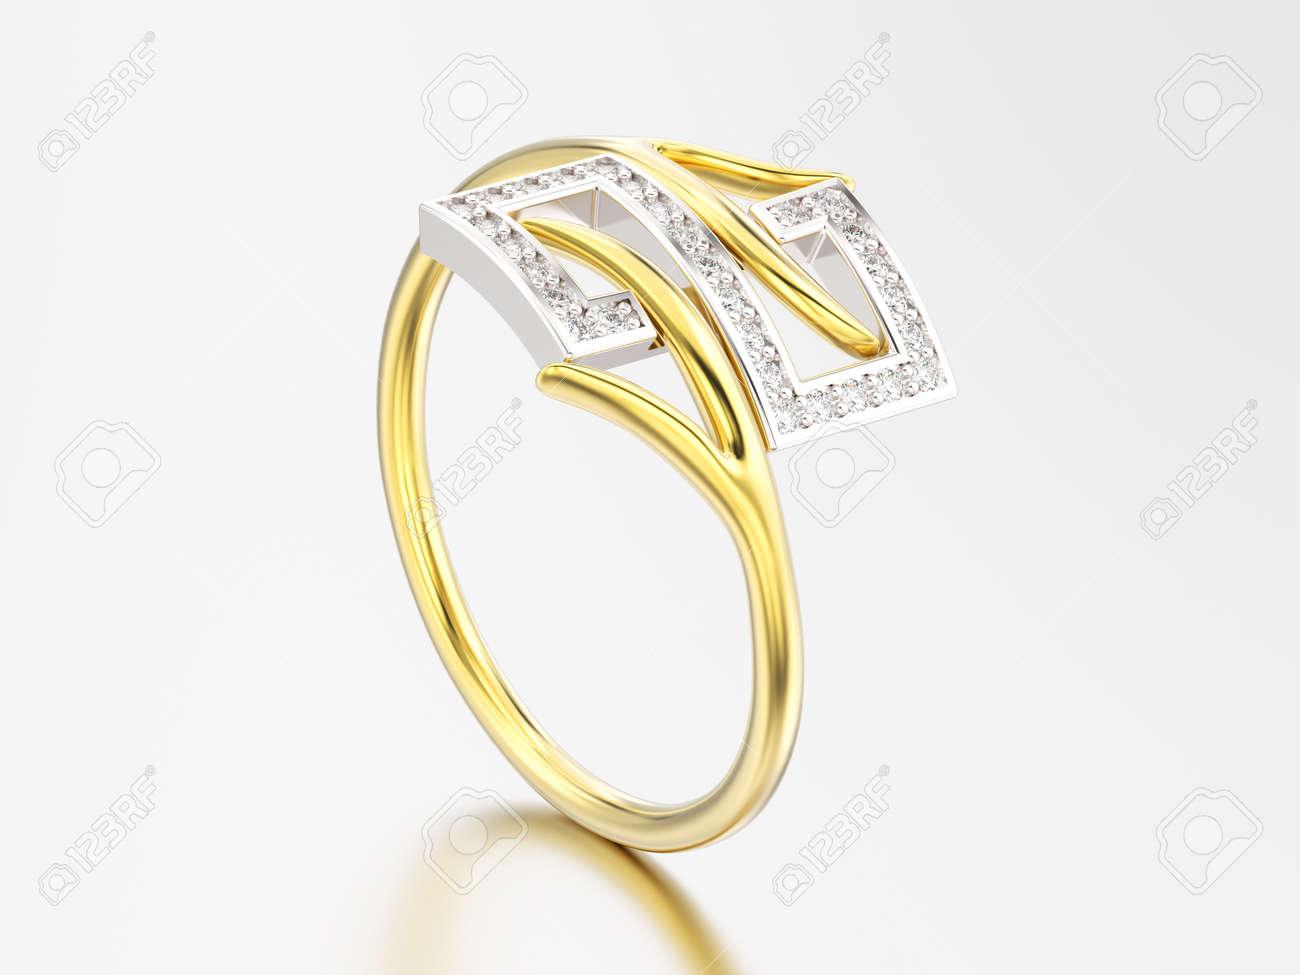 bague or jaune et blanc avec diamant